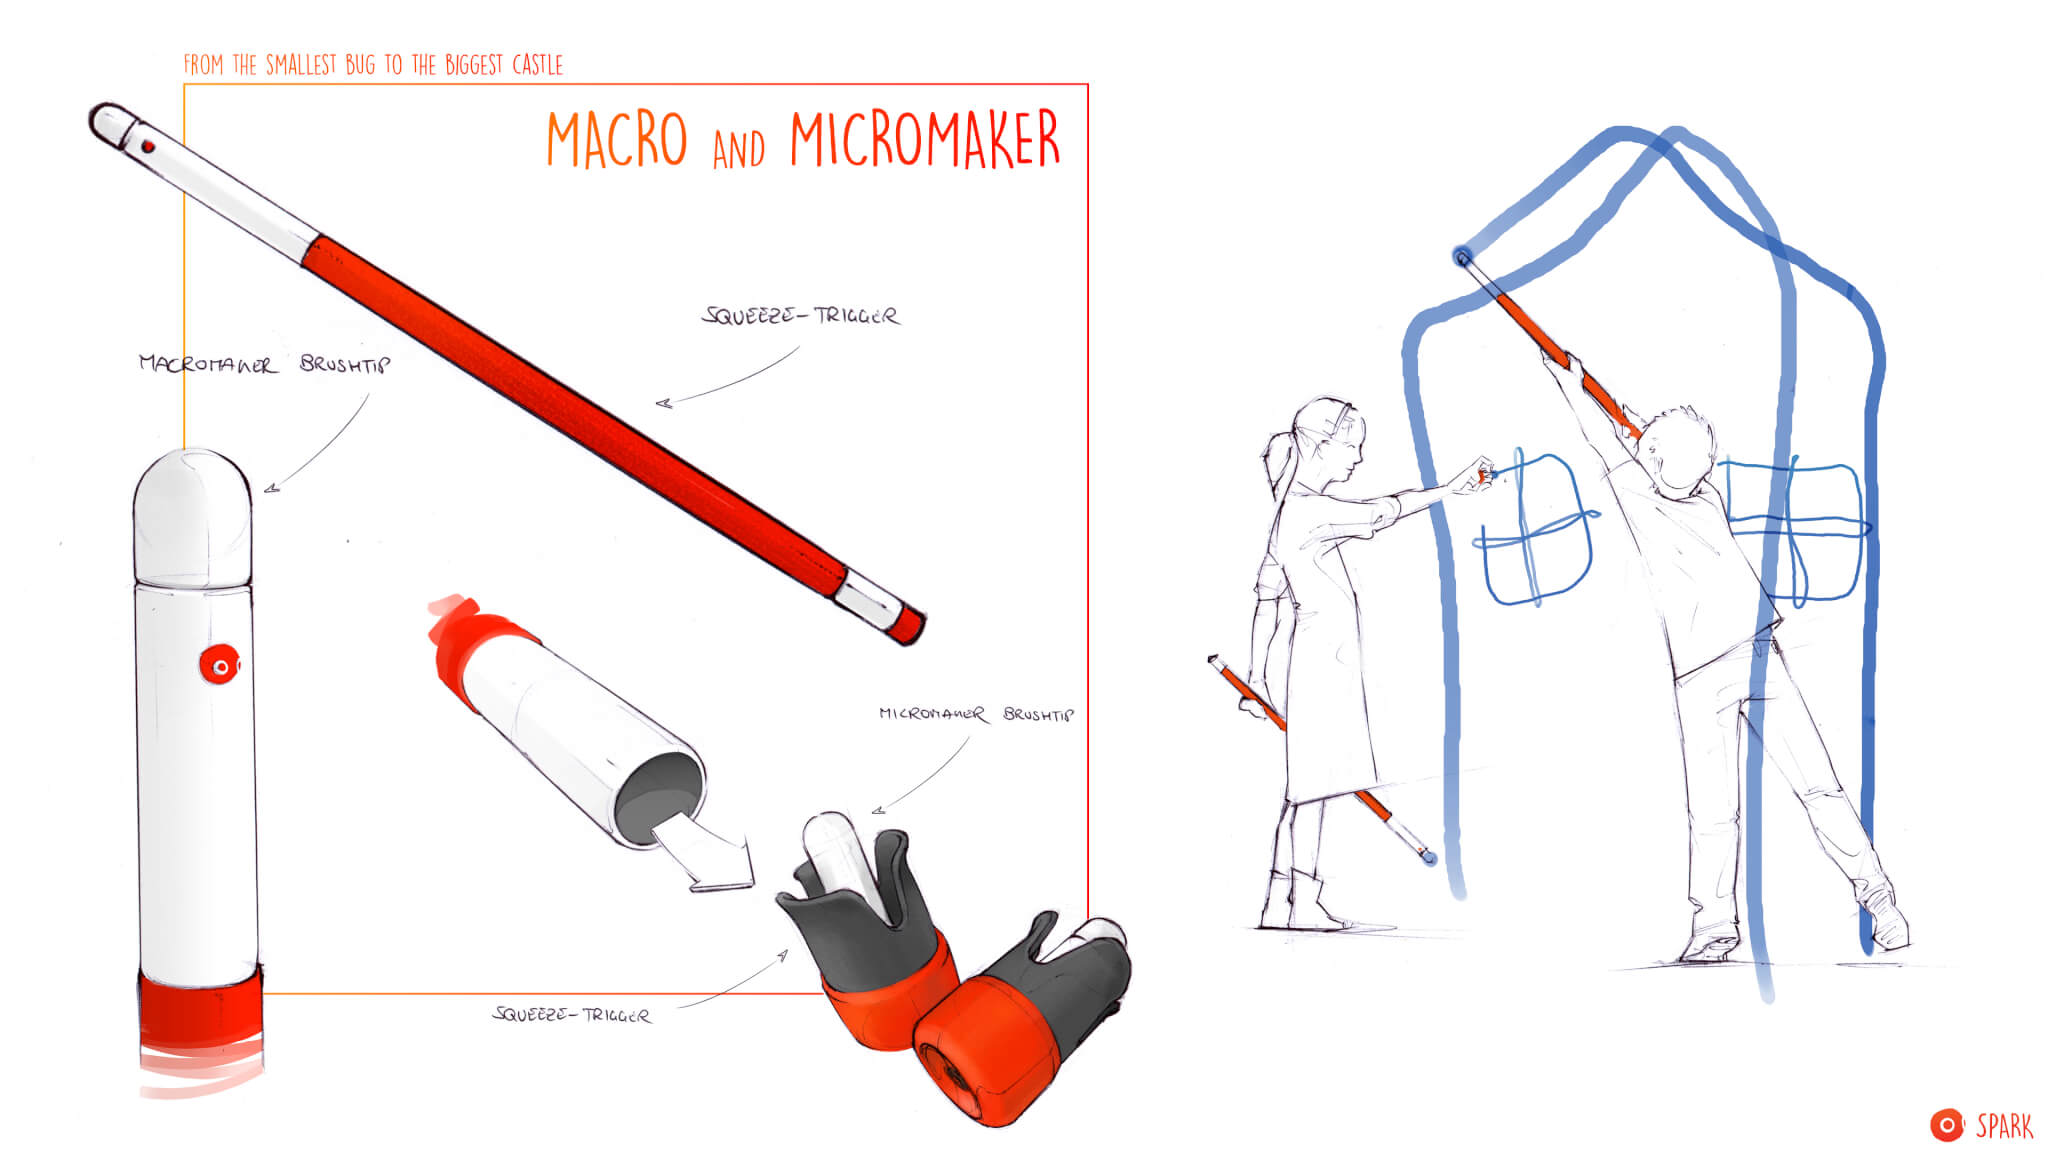 Macro and Micromaker